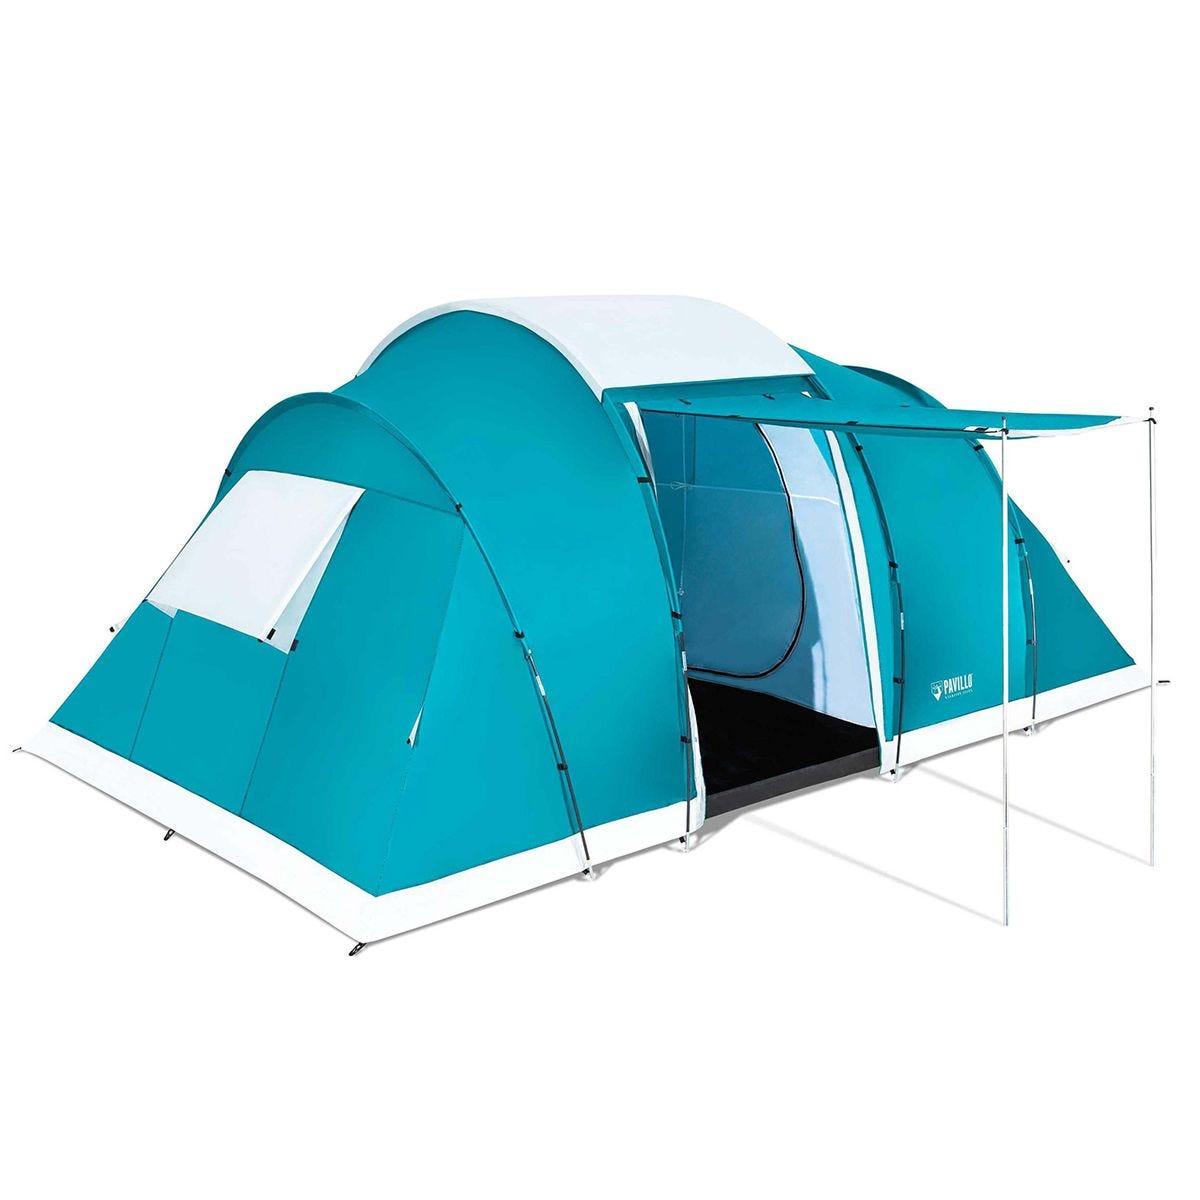 Pavillo Family Ground 6 Person Tent - 4.90 x 2.80 x 2.00m